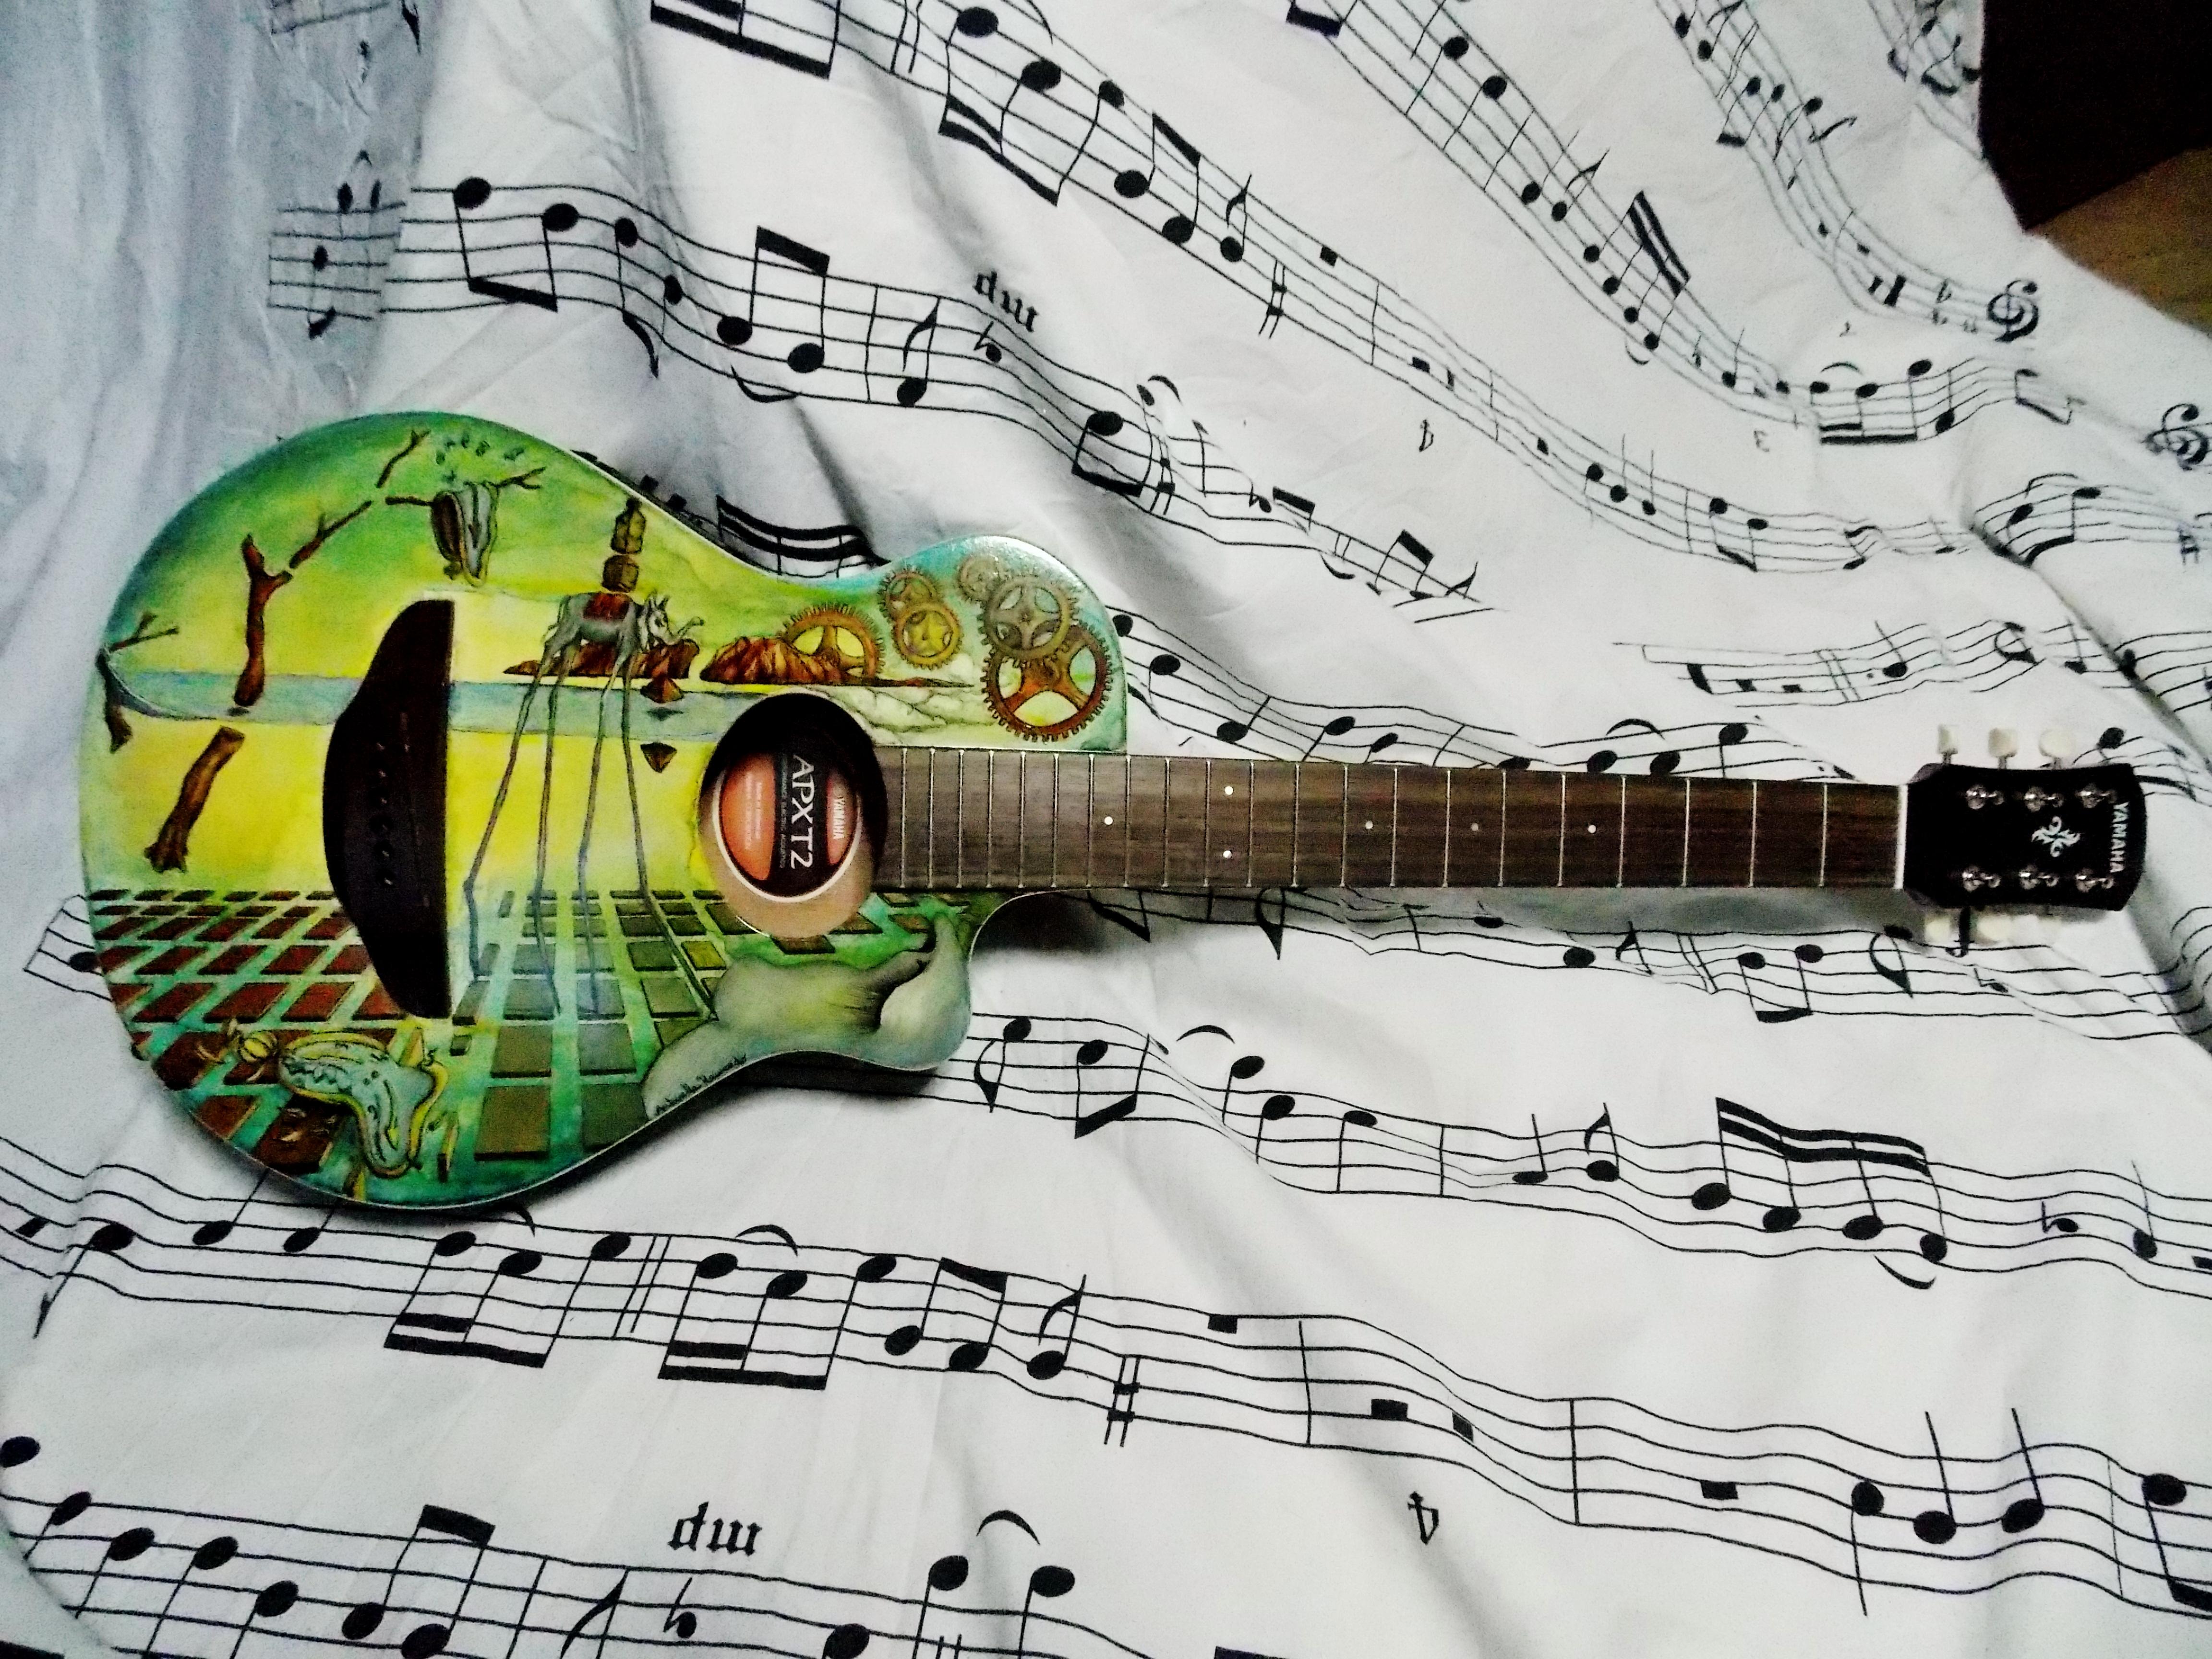 Dali guitar front